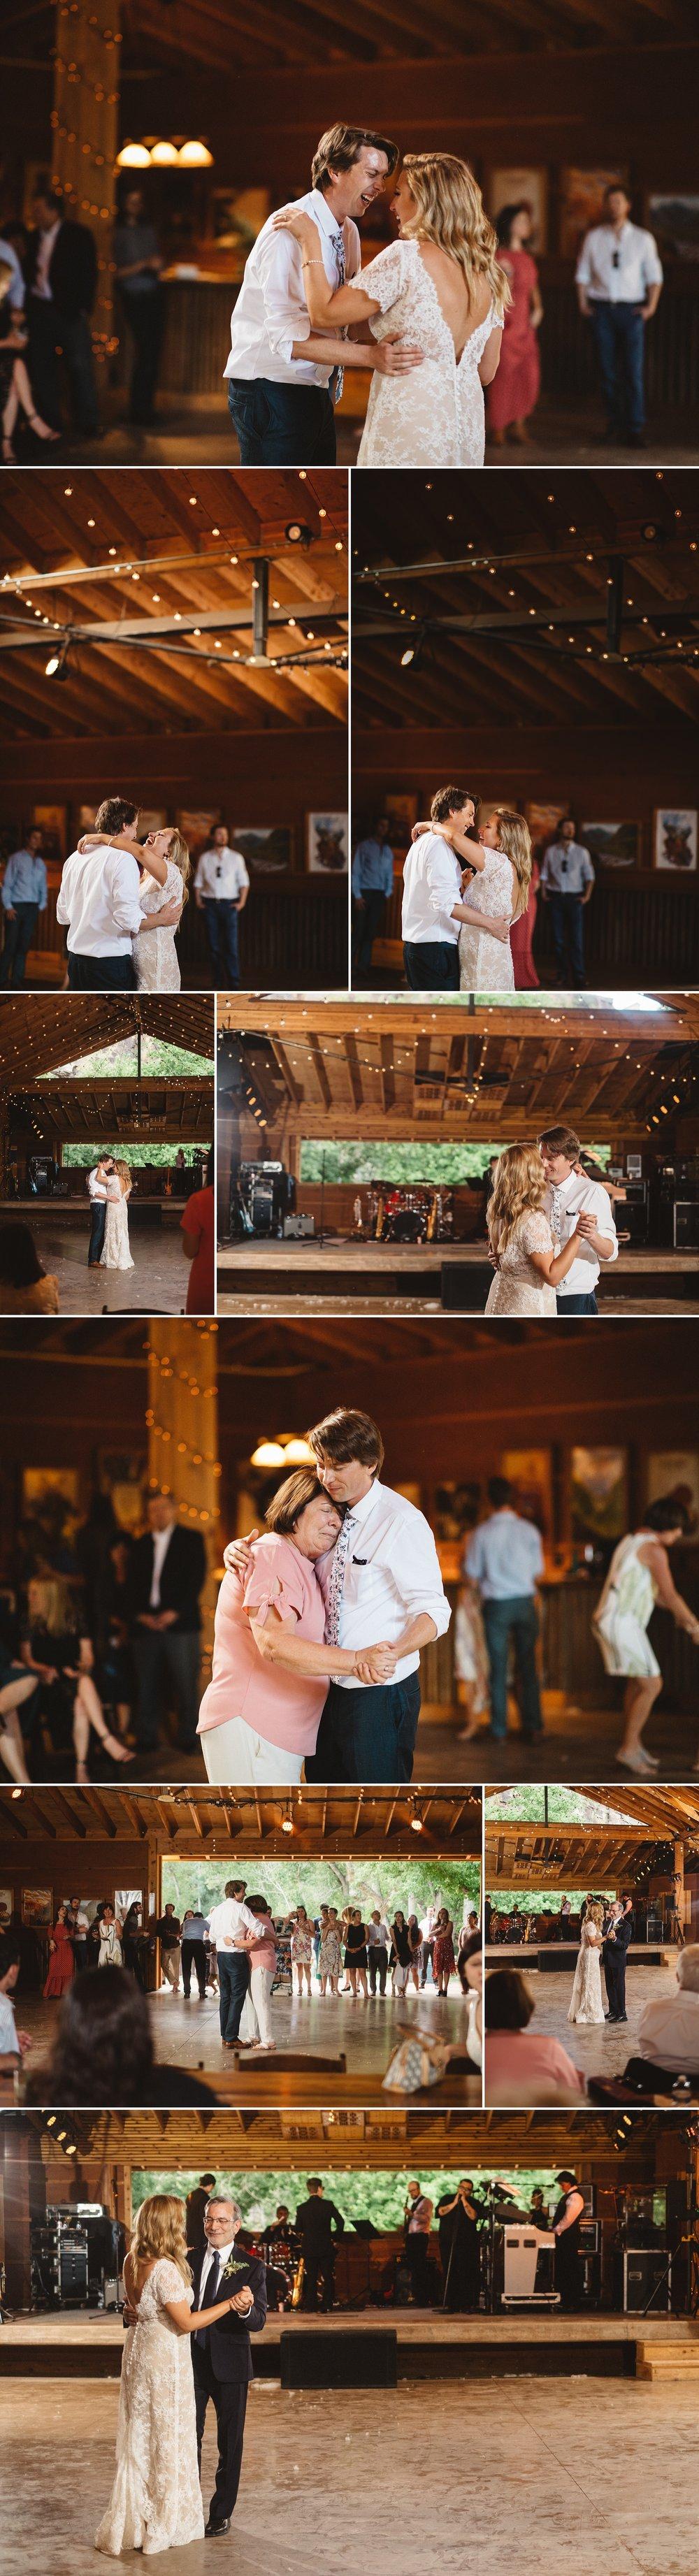 Planet-Bluegrass-Wedding-Lyons-Colorado-First-Dance-Photos